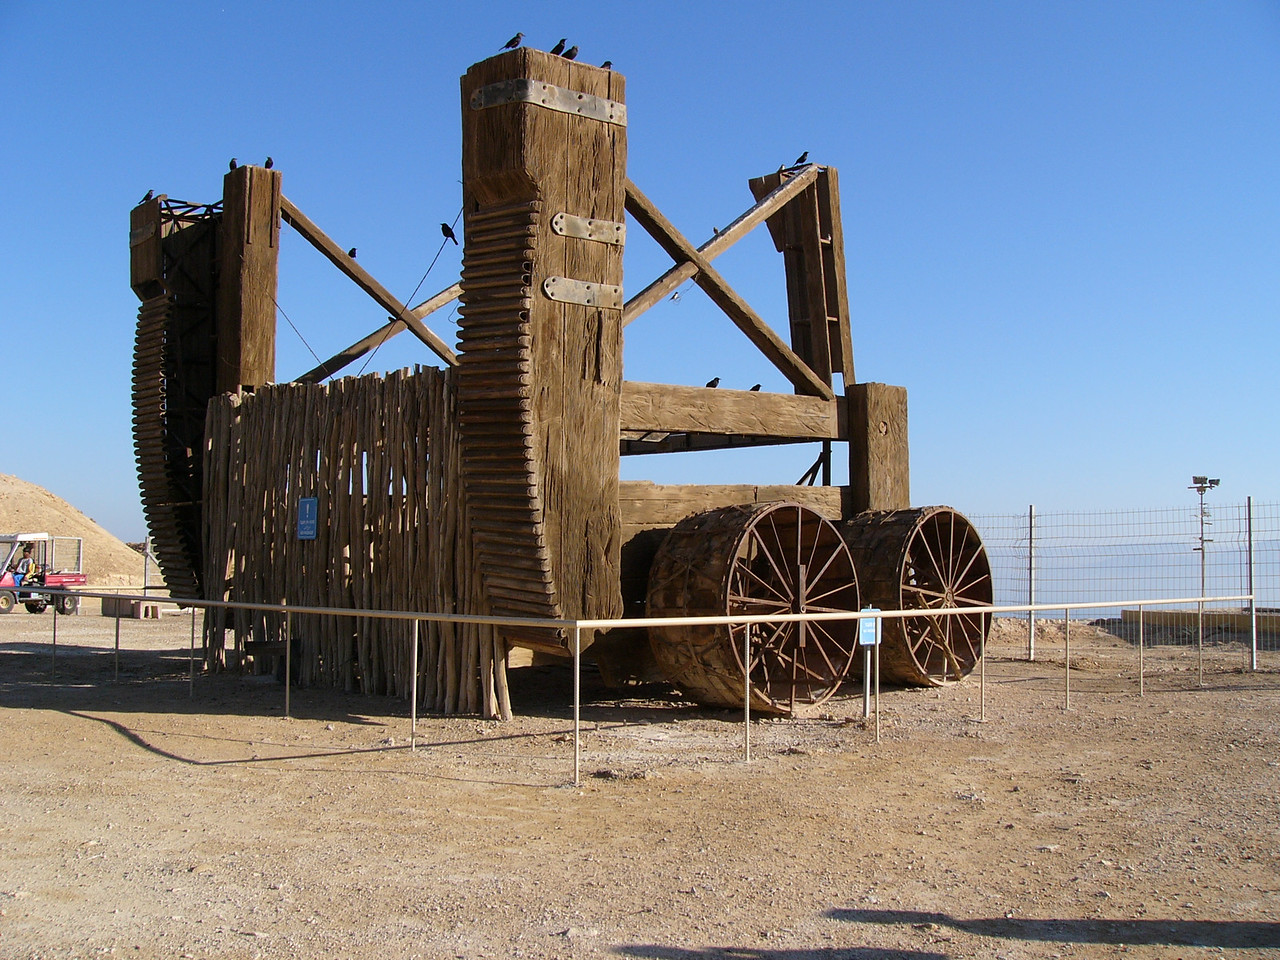 Masada siege engine